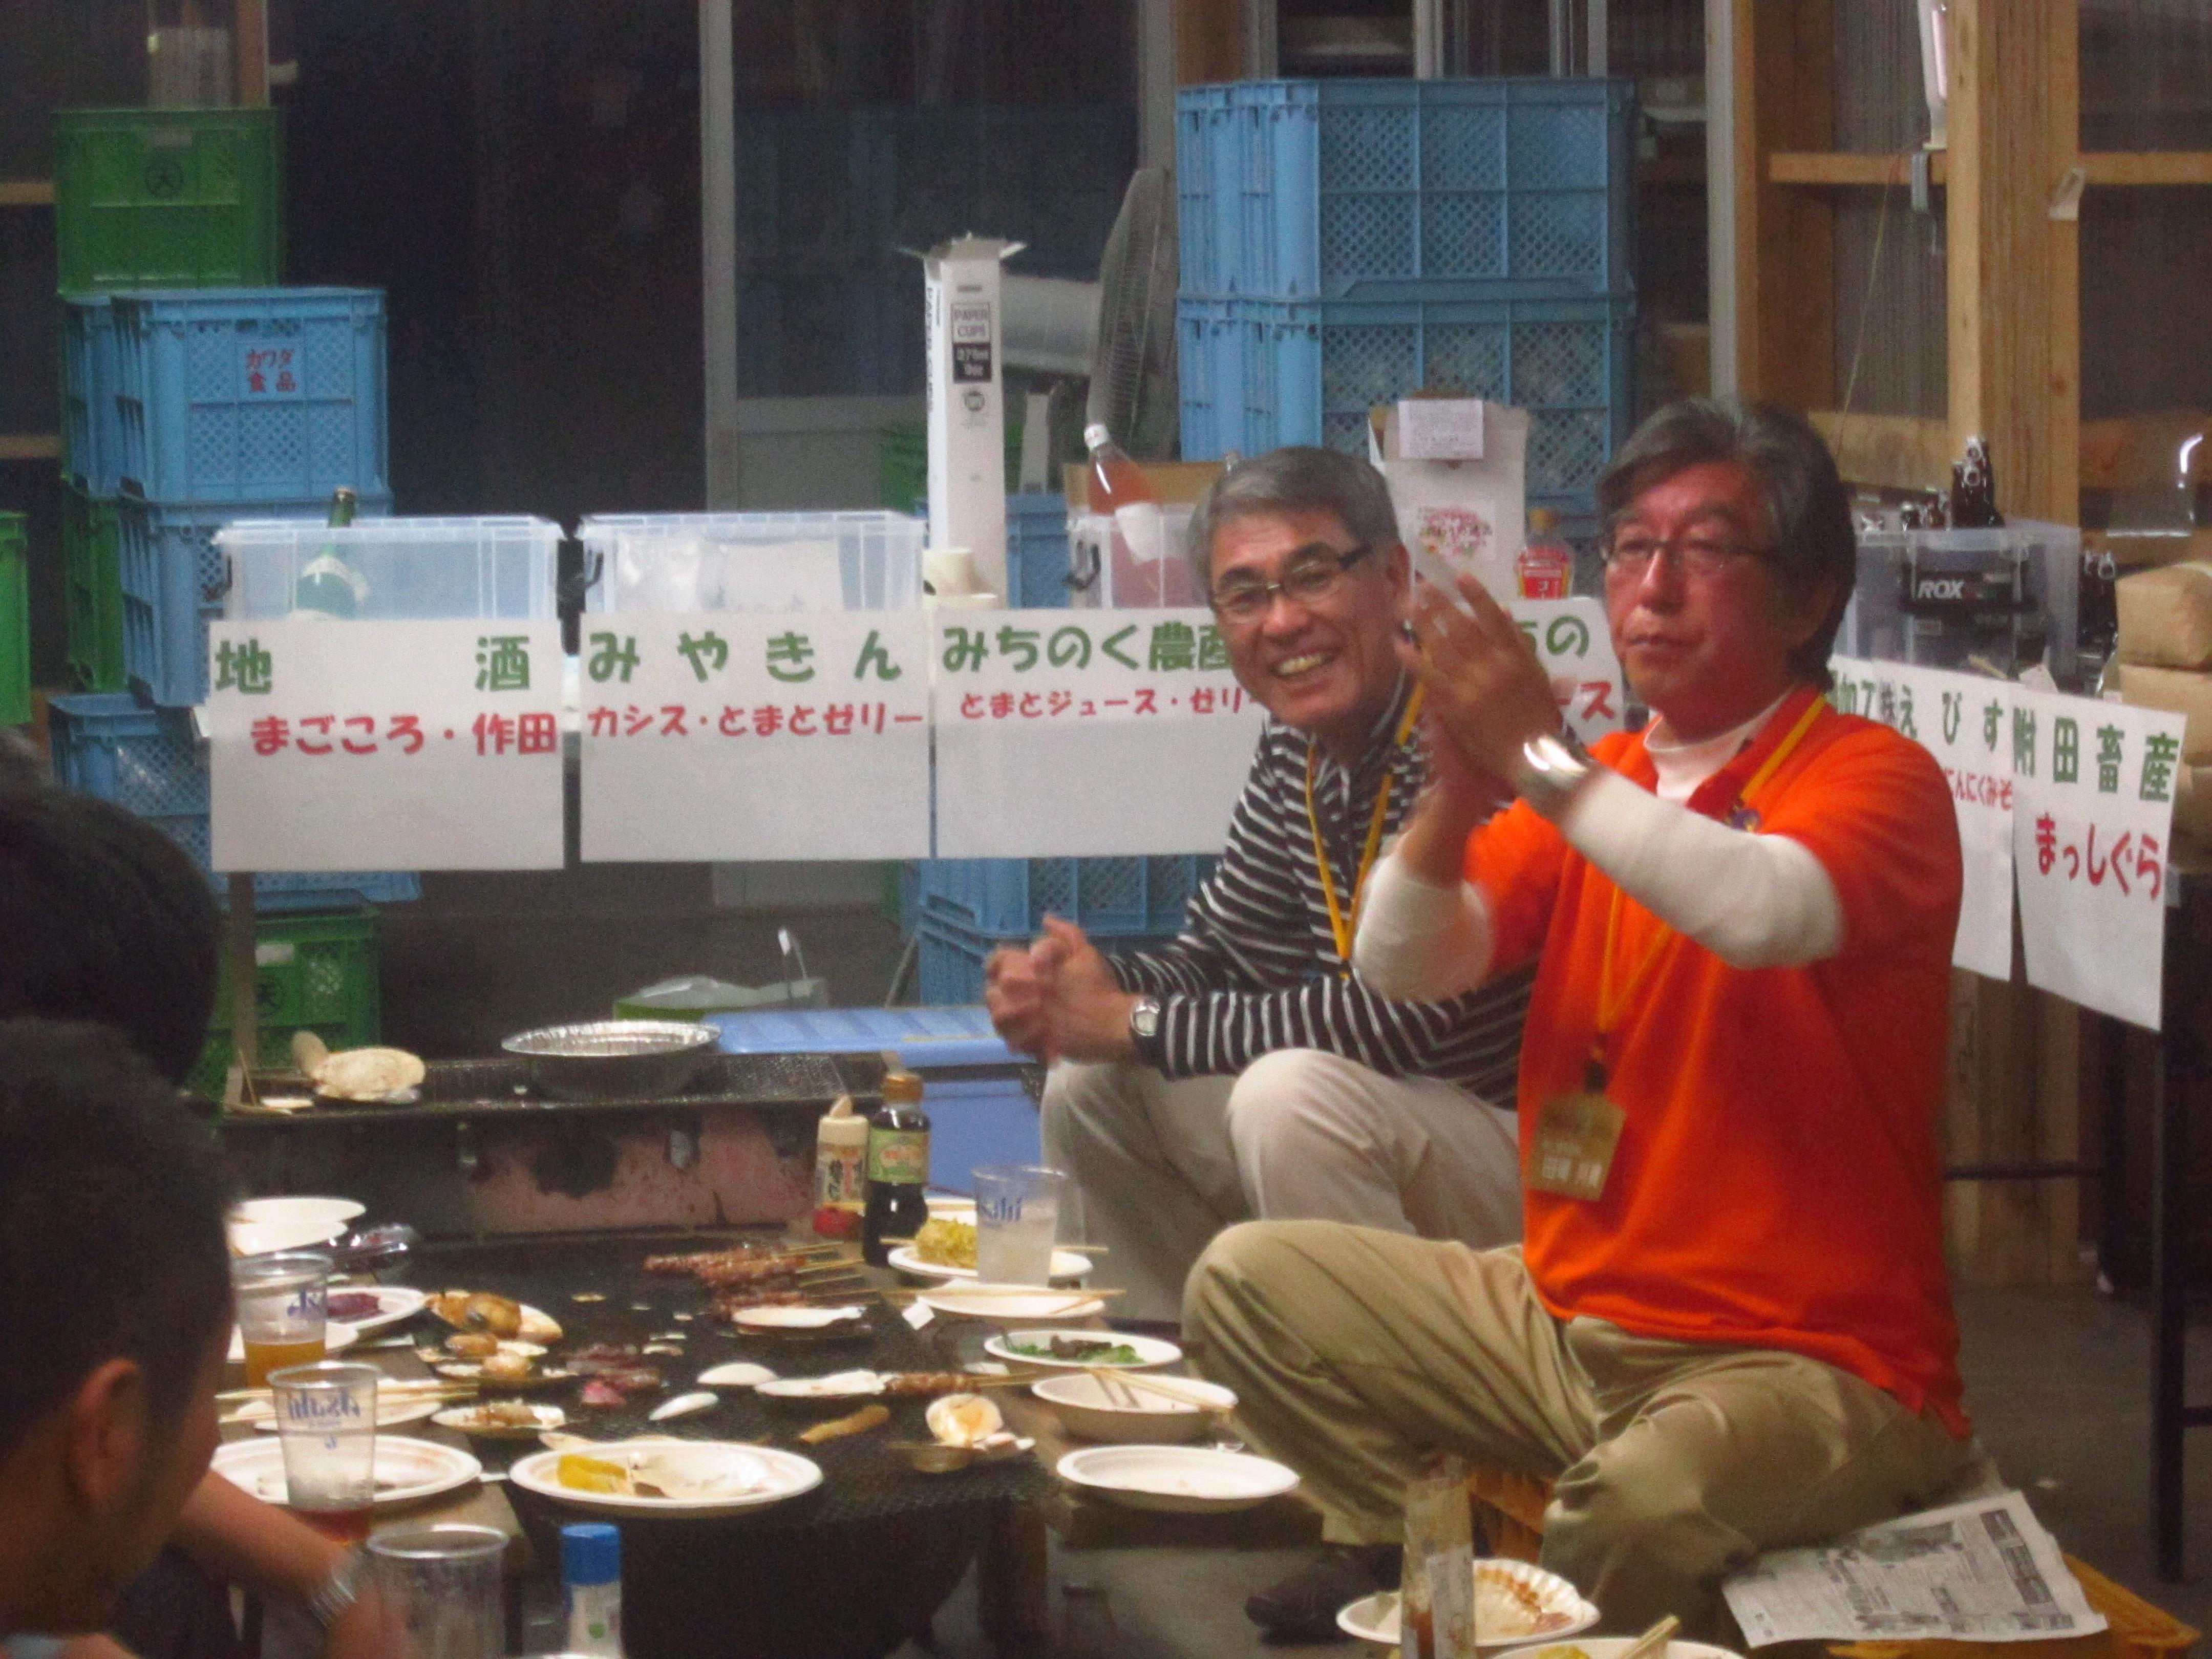 IMG 4318 - 麻布十番納涼祭り25,26日(七戸町出店)